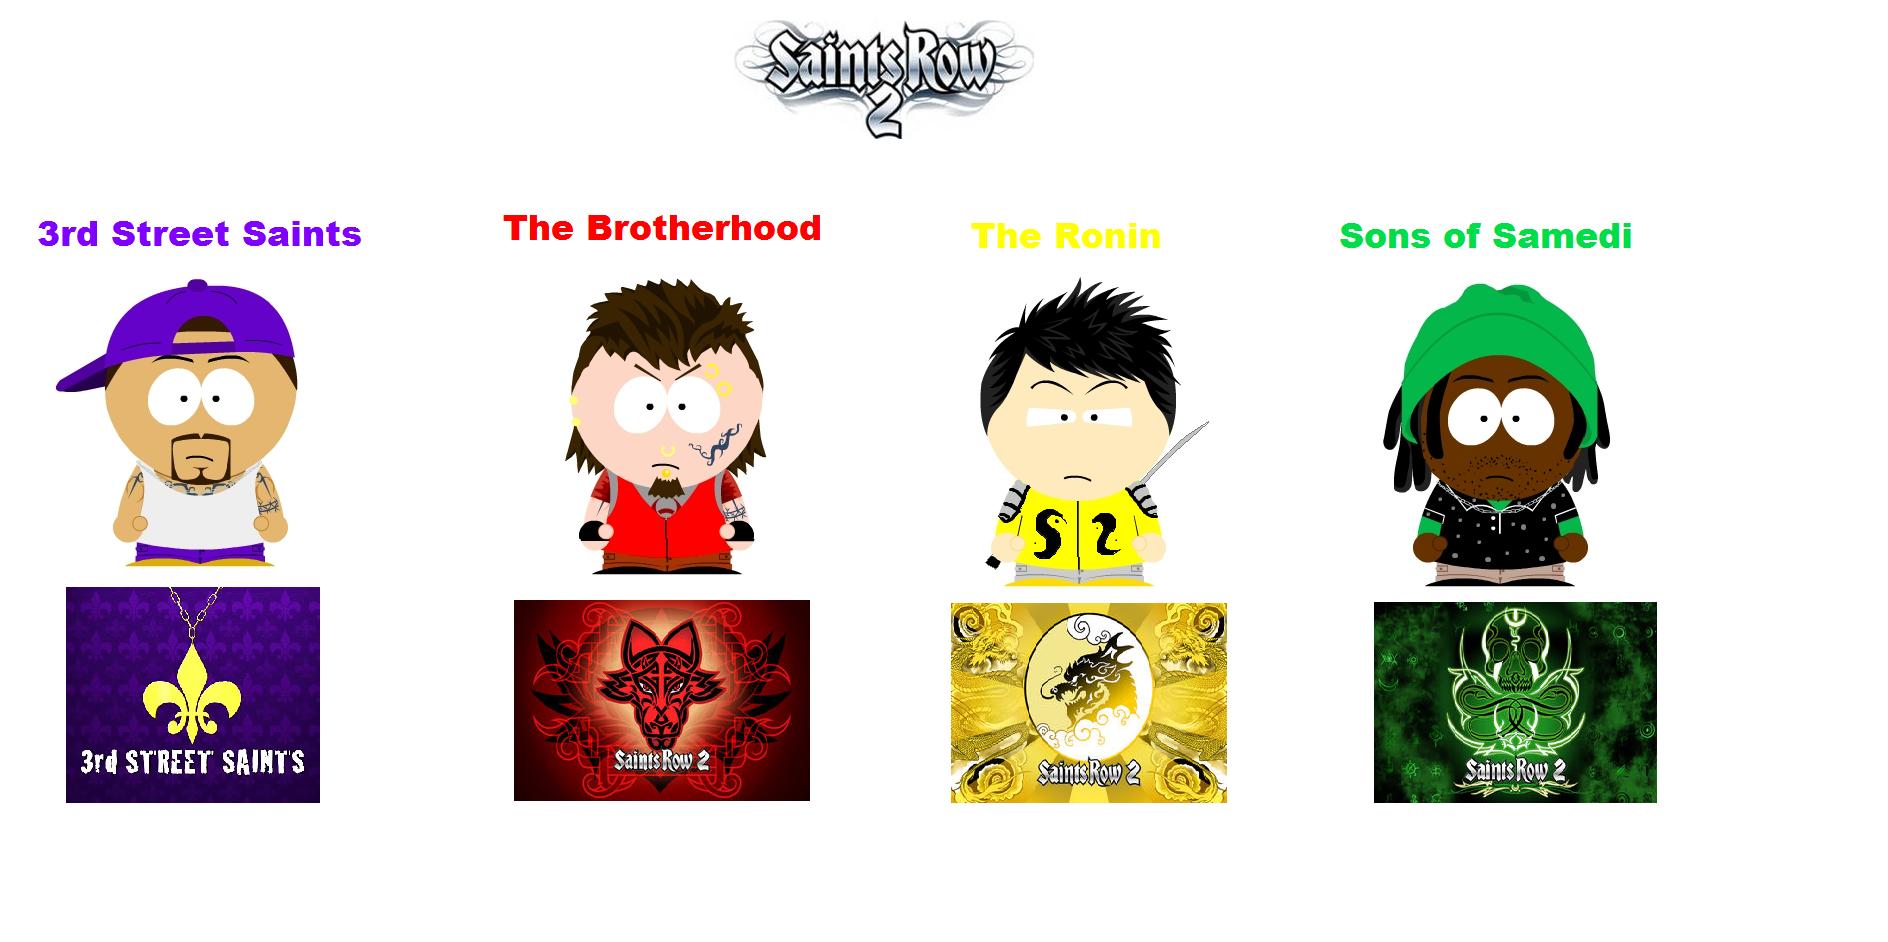 South Park: Saints Row 2 Gangs by deonpalmer45 on DeviantArt